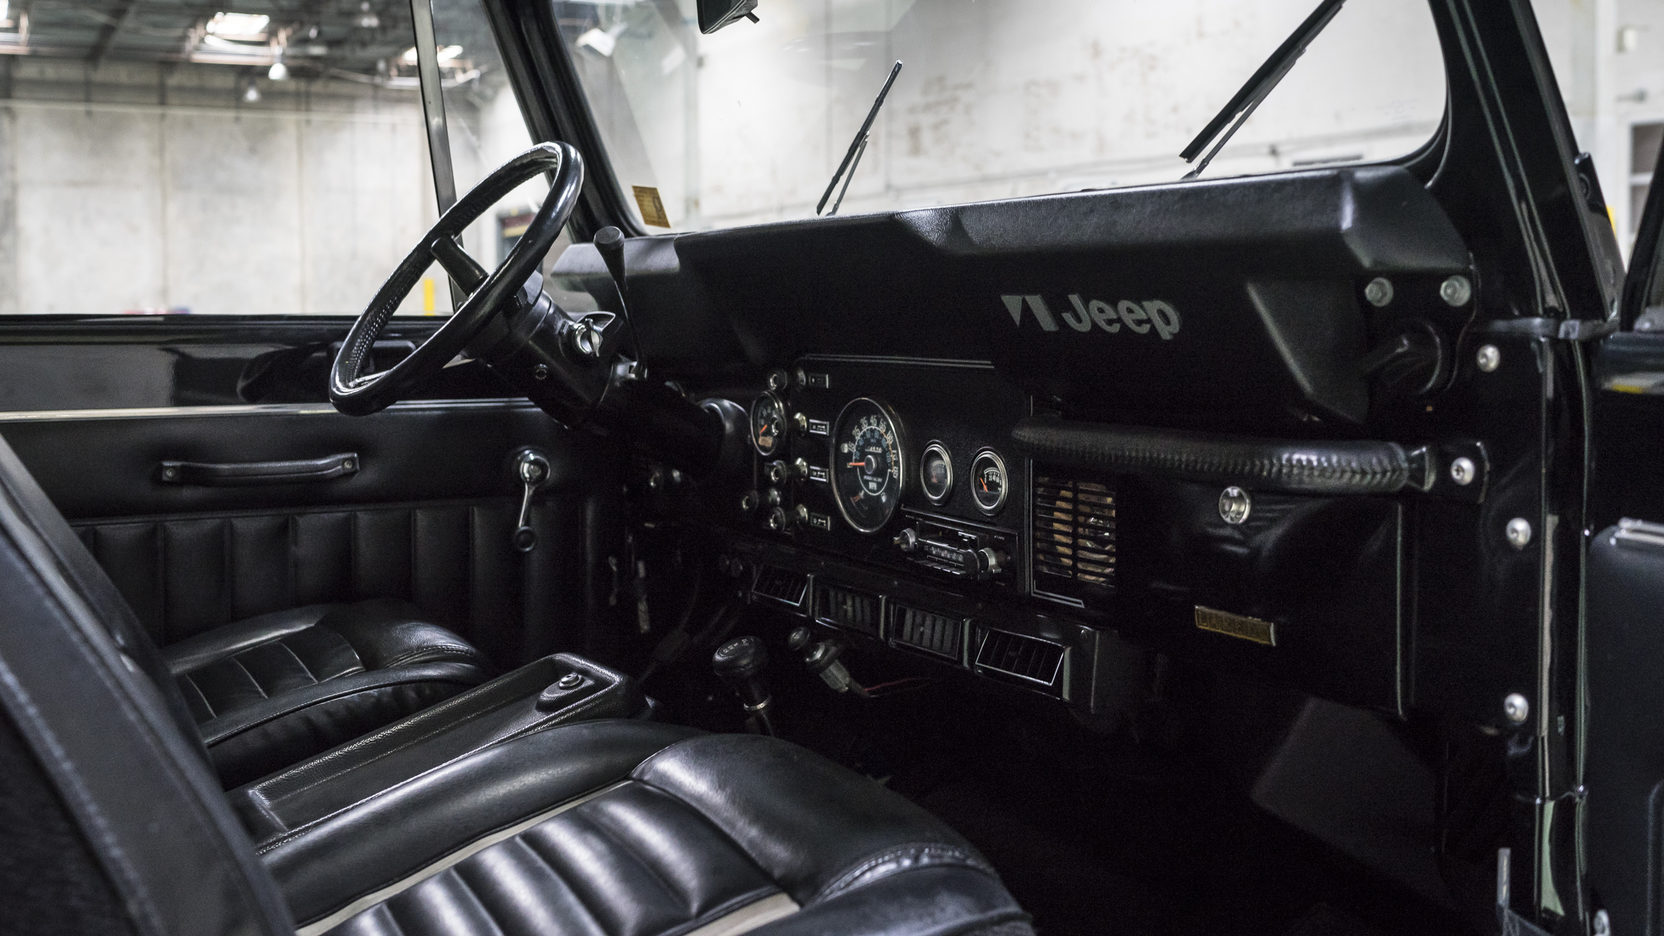 1981 Jeep CJ-7 interior passenger